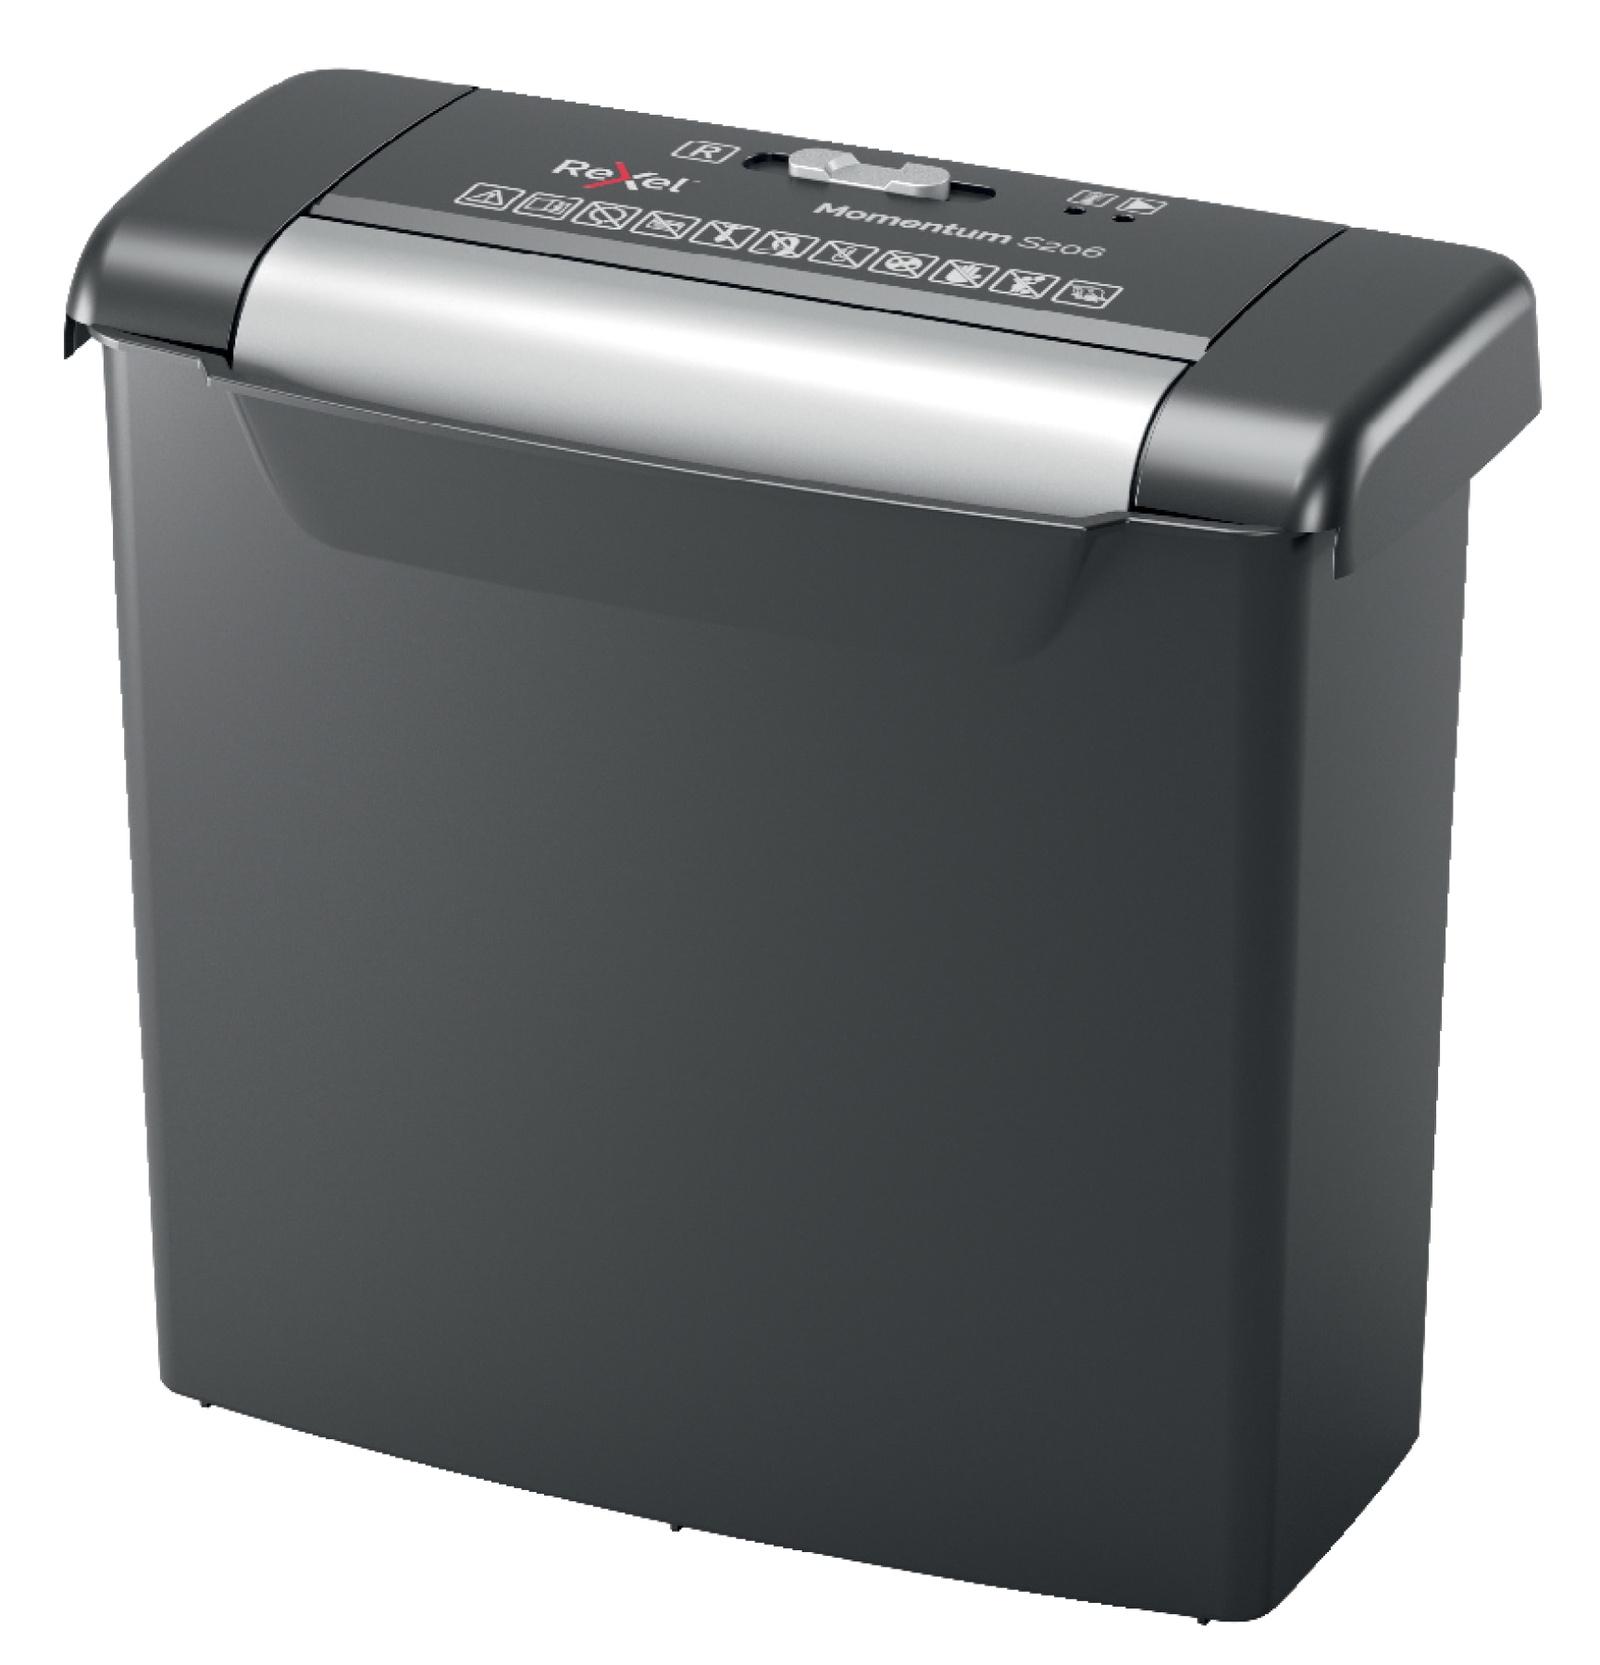 Шредер Rexel Momentum S206, черно-серый